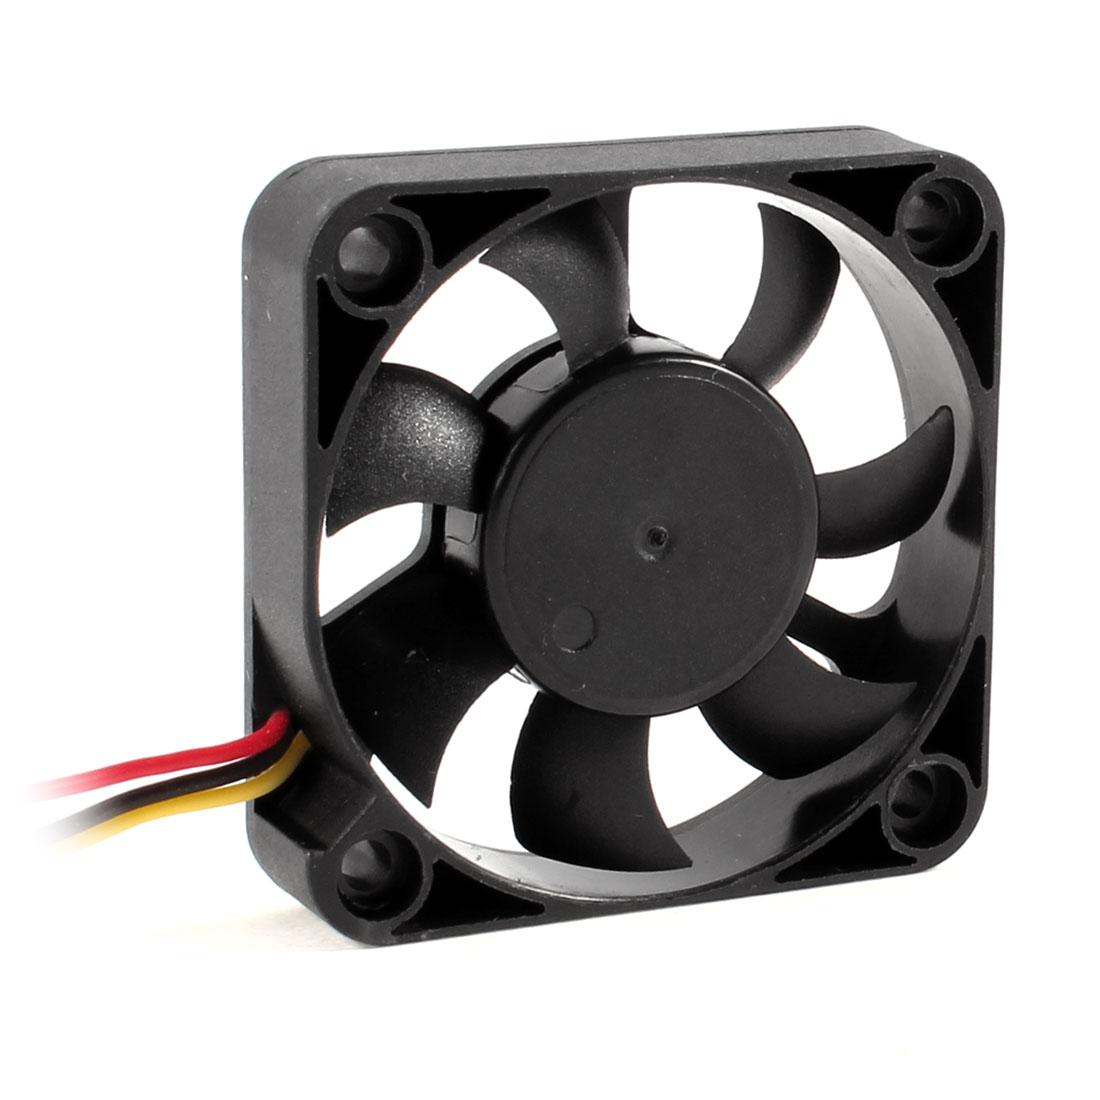 50mm x 10mm Sleeve Bearing Computer CPU Cooler Cooling Fan